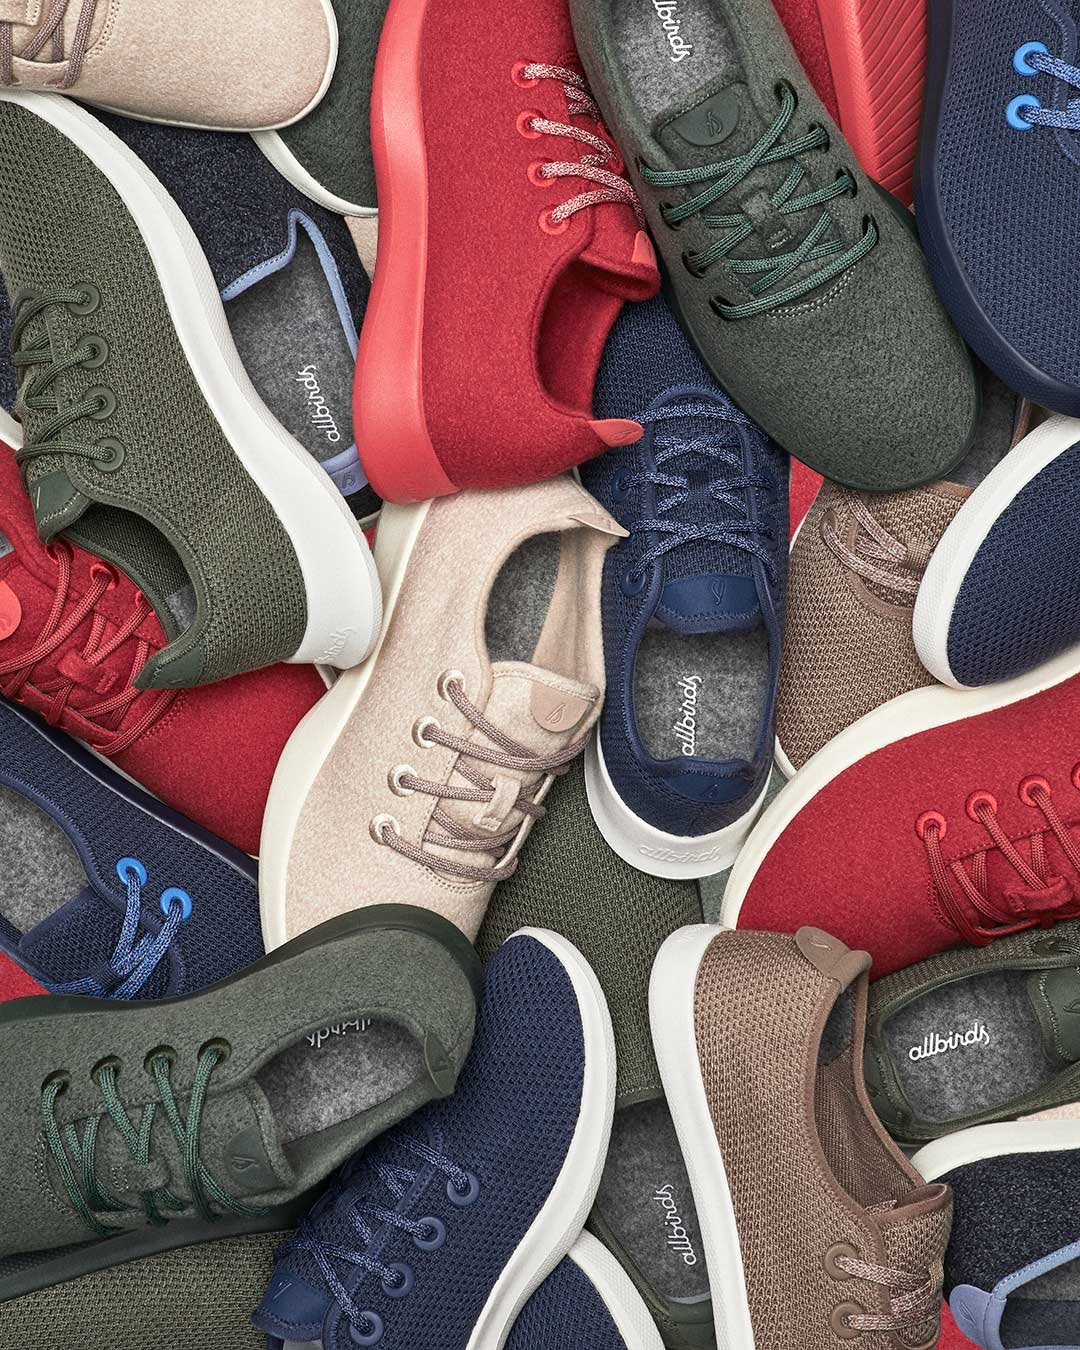 New Allbirds Shoe Colors Just Launched